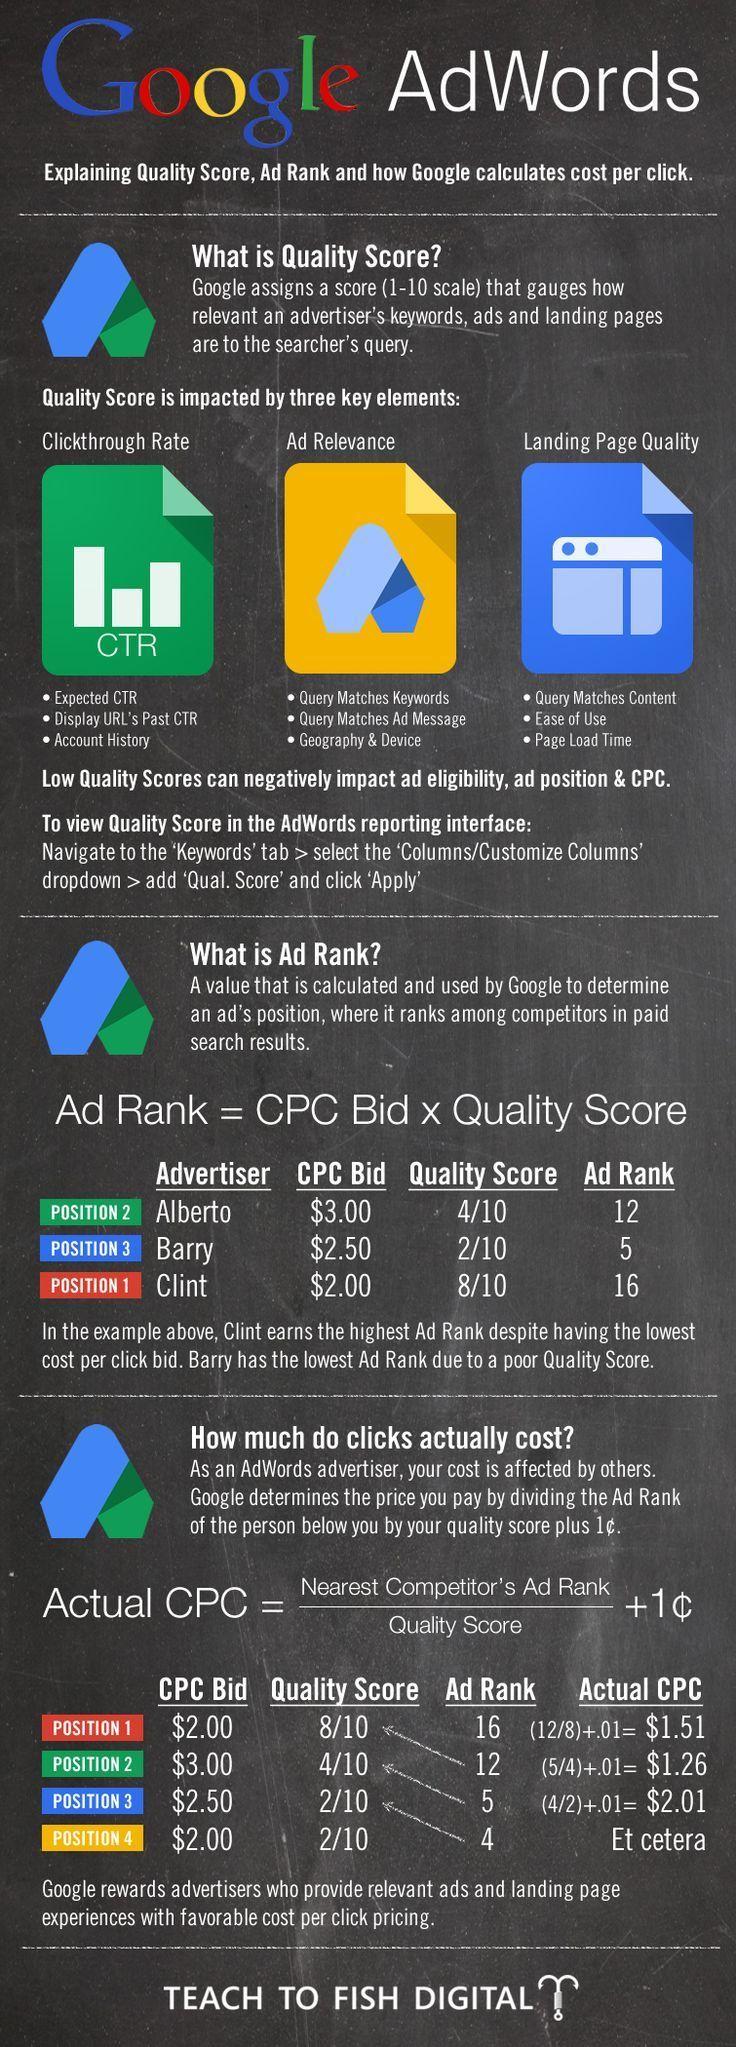 1546120047_571_Advertising-Infographics-Google-Adwords-Quality-Score-Infographic-via-Chris-Sietsema-teachtofishdigita Advertising Infographics : Google Adwords Quality Score Infographic via Chris Sietsema - teachtofishdigita....